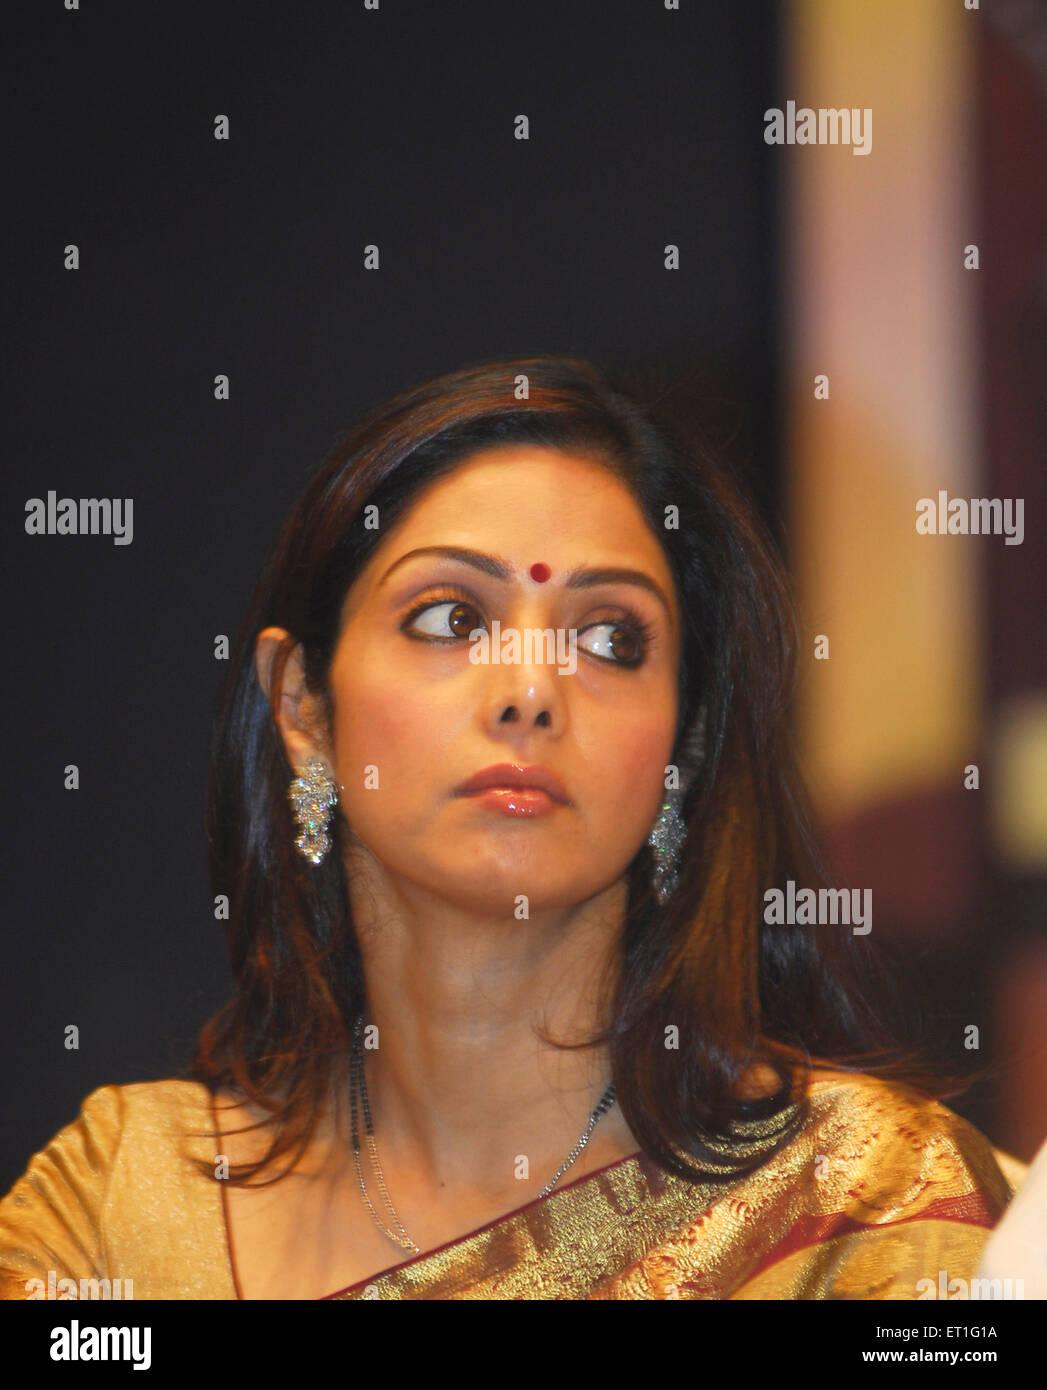 Actress sridevi ; India NO MR - Stock Image